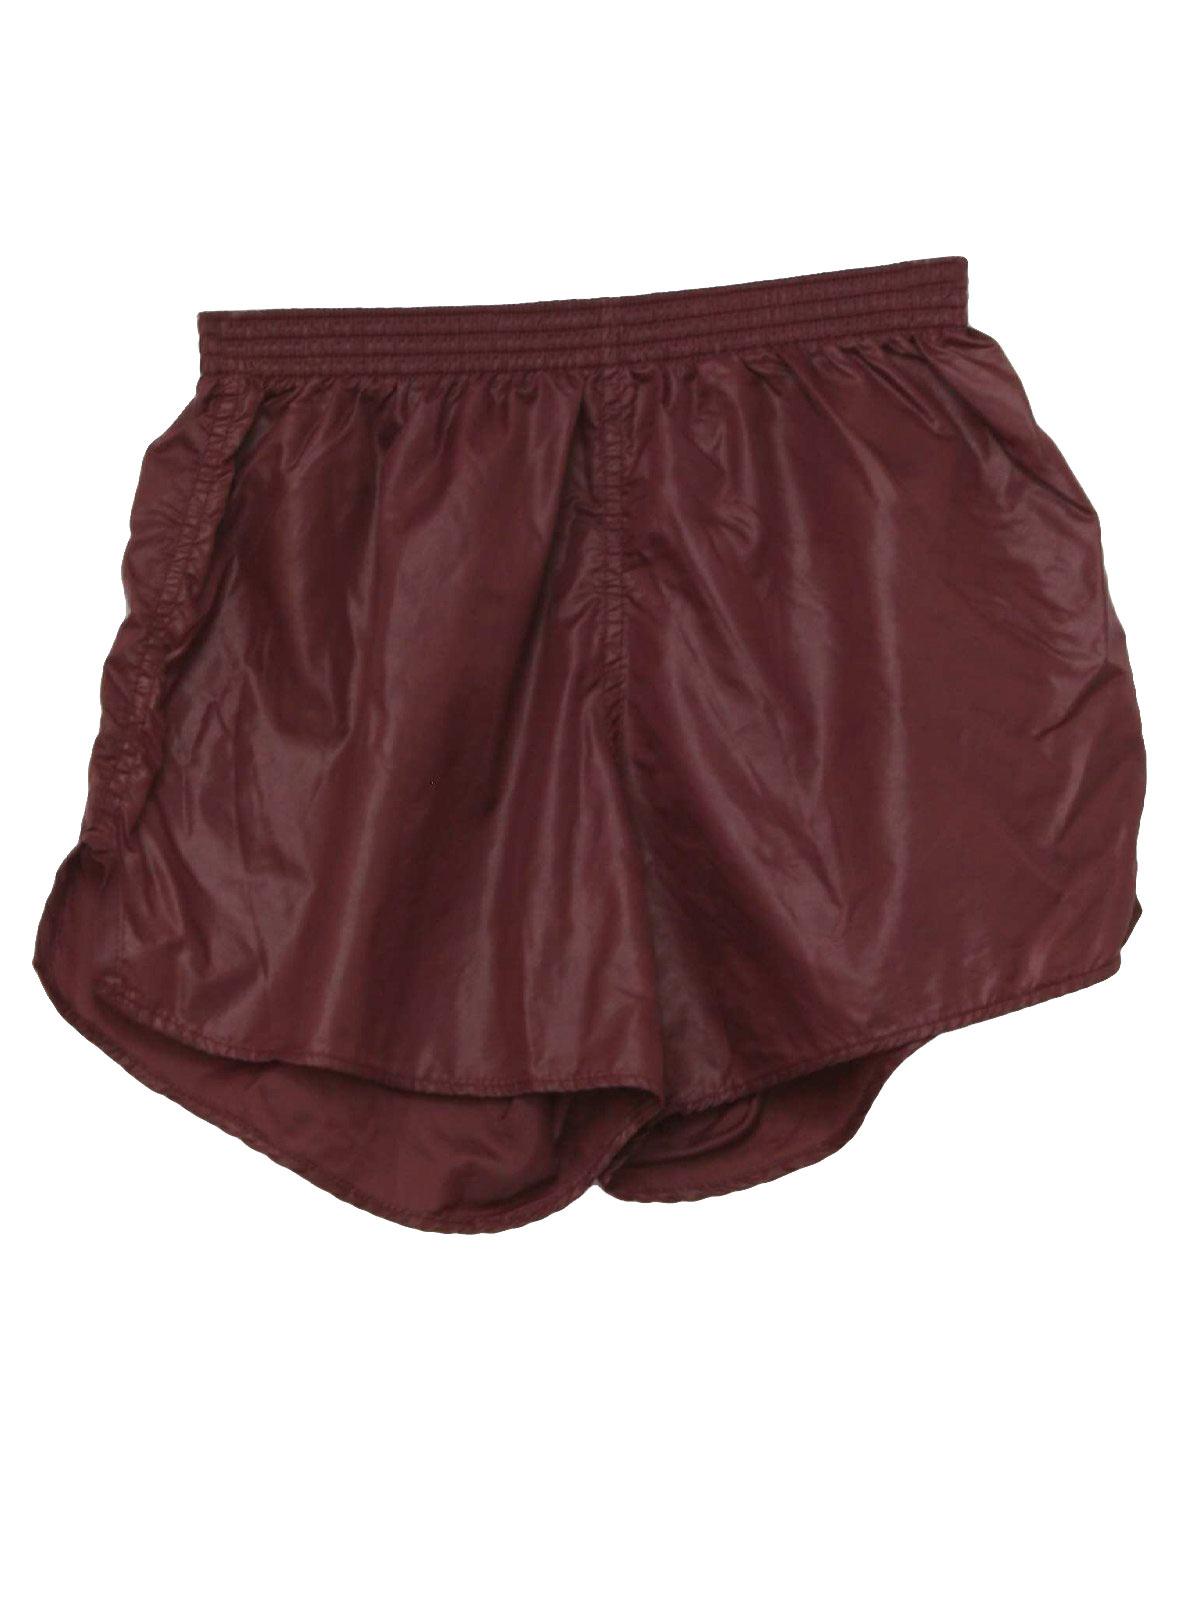 1980s Vintage Shorts: 80s -MJ Soffe- Mens burgundy nylon, elastic ...